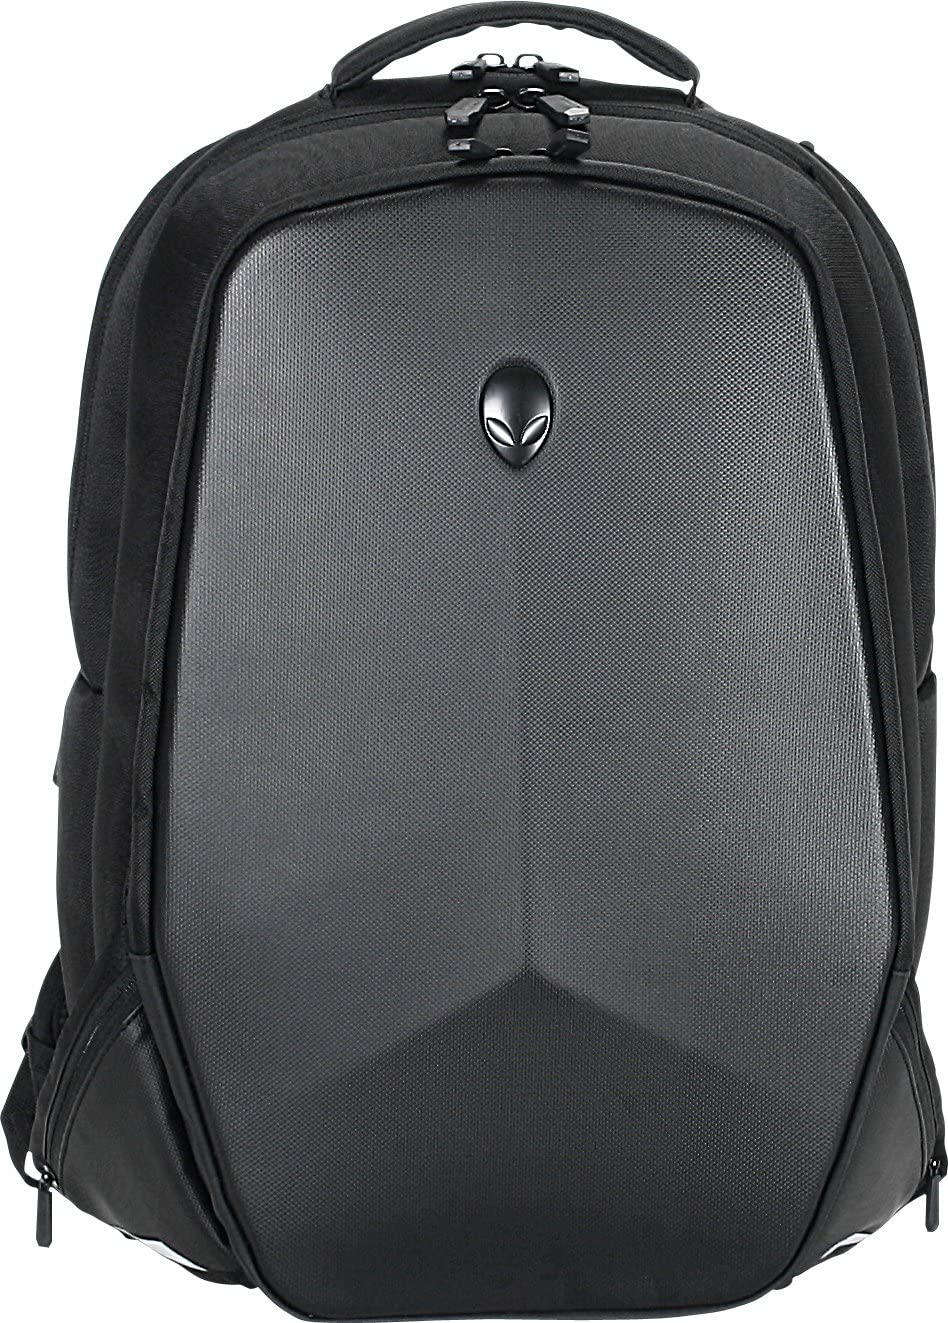 Alienware Vindicator Gaming Laptop Backpack 13-Inch/14-Inch, Black (AWVBP14)